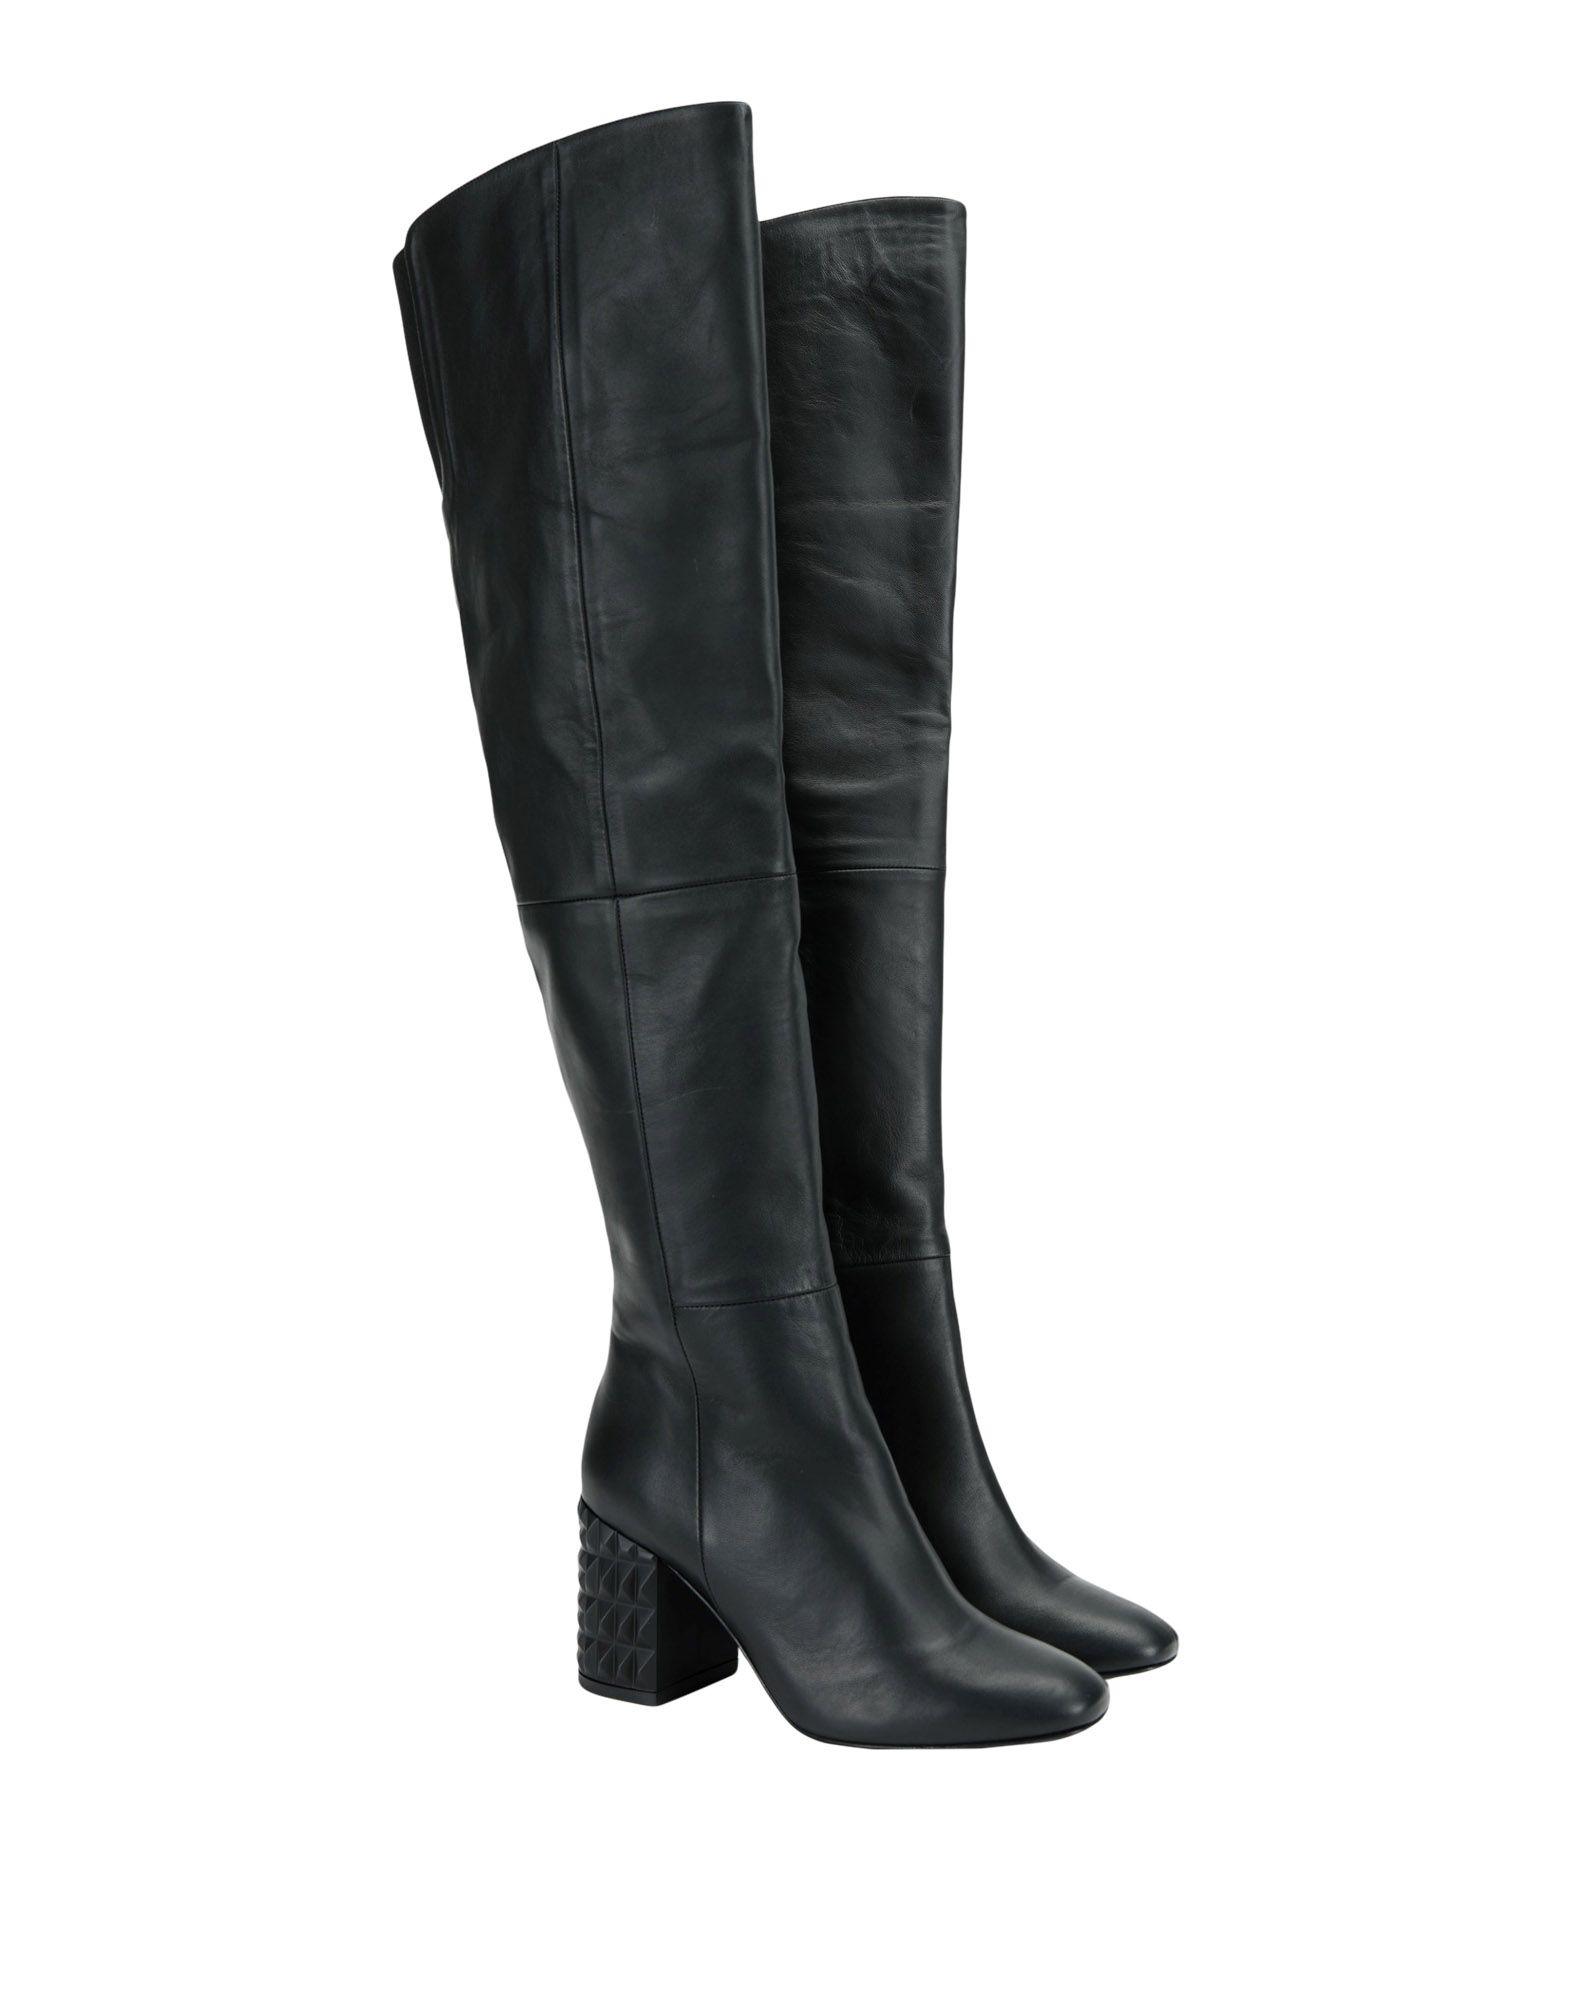 Rabatt Schuhe Stiefel Stephen Good London Stiefel Schuhe Damen 11533120FJ a9b89a